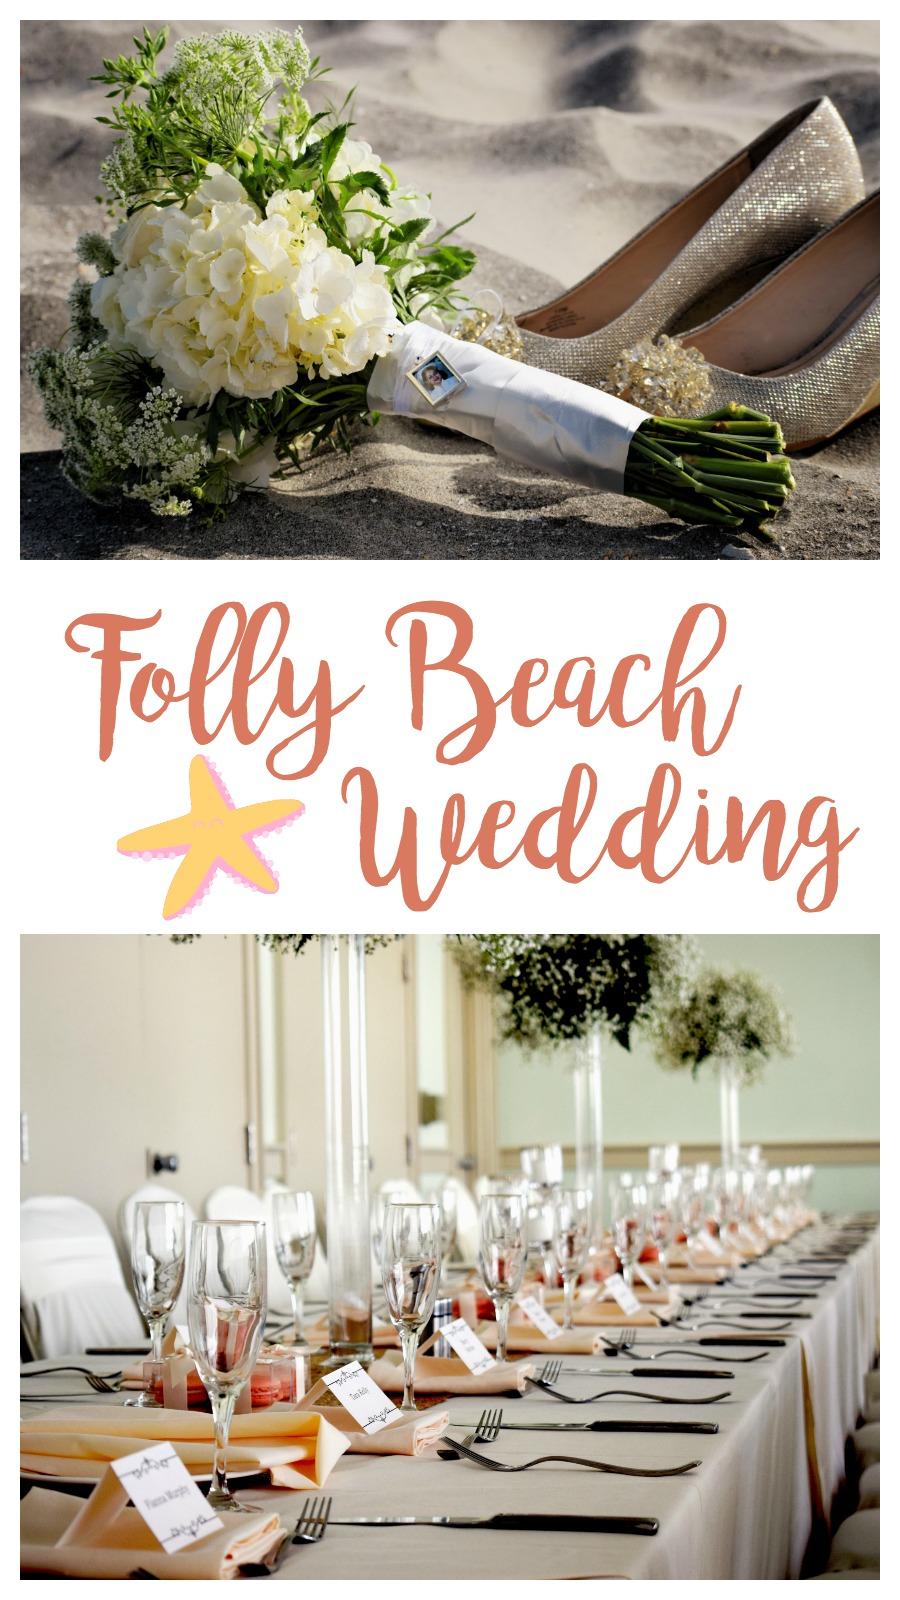 Jennifer + Gary: Sunny Folly Beach Wedding in the Sand | Palmetto State Weddings | Dandelion Wedding Photography | Charleston beach weddings